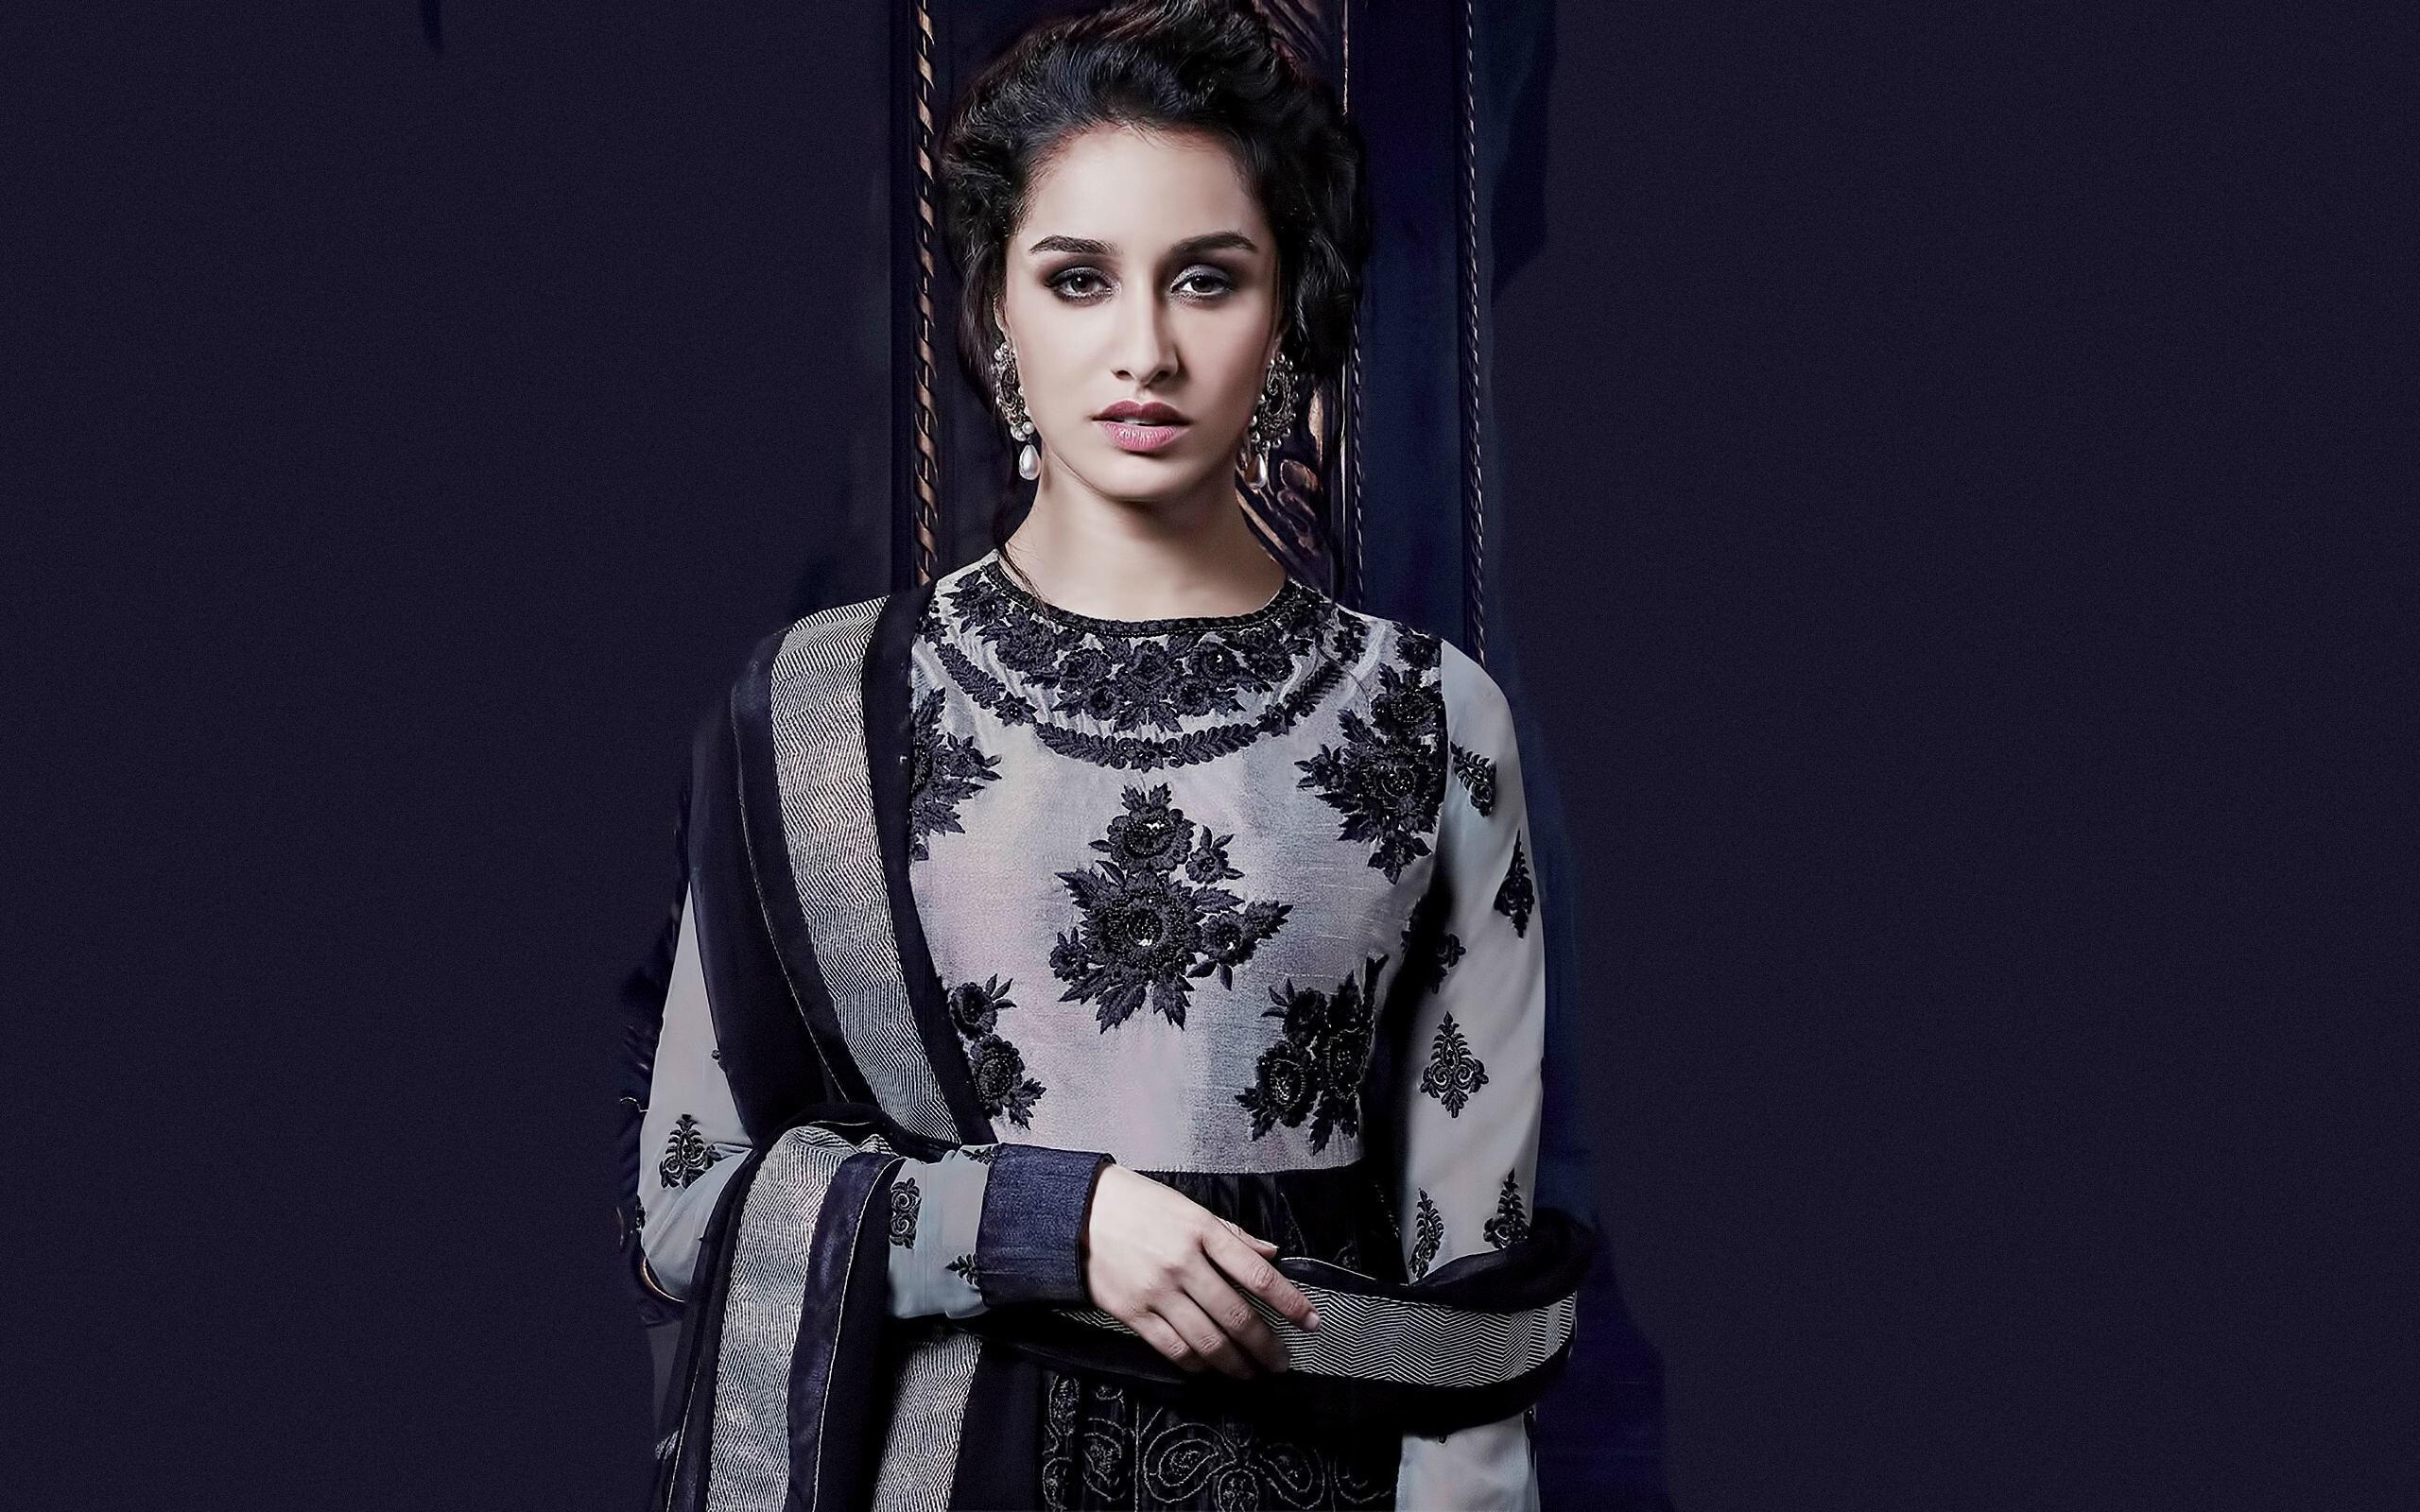 Beautiful Shraddha Kapoor In Dress Wallpaper Hd Wallpapers